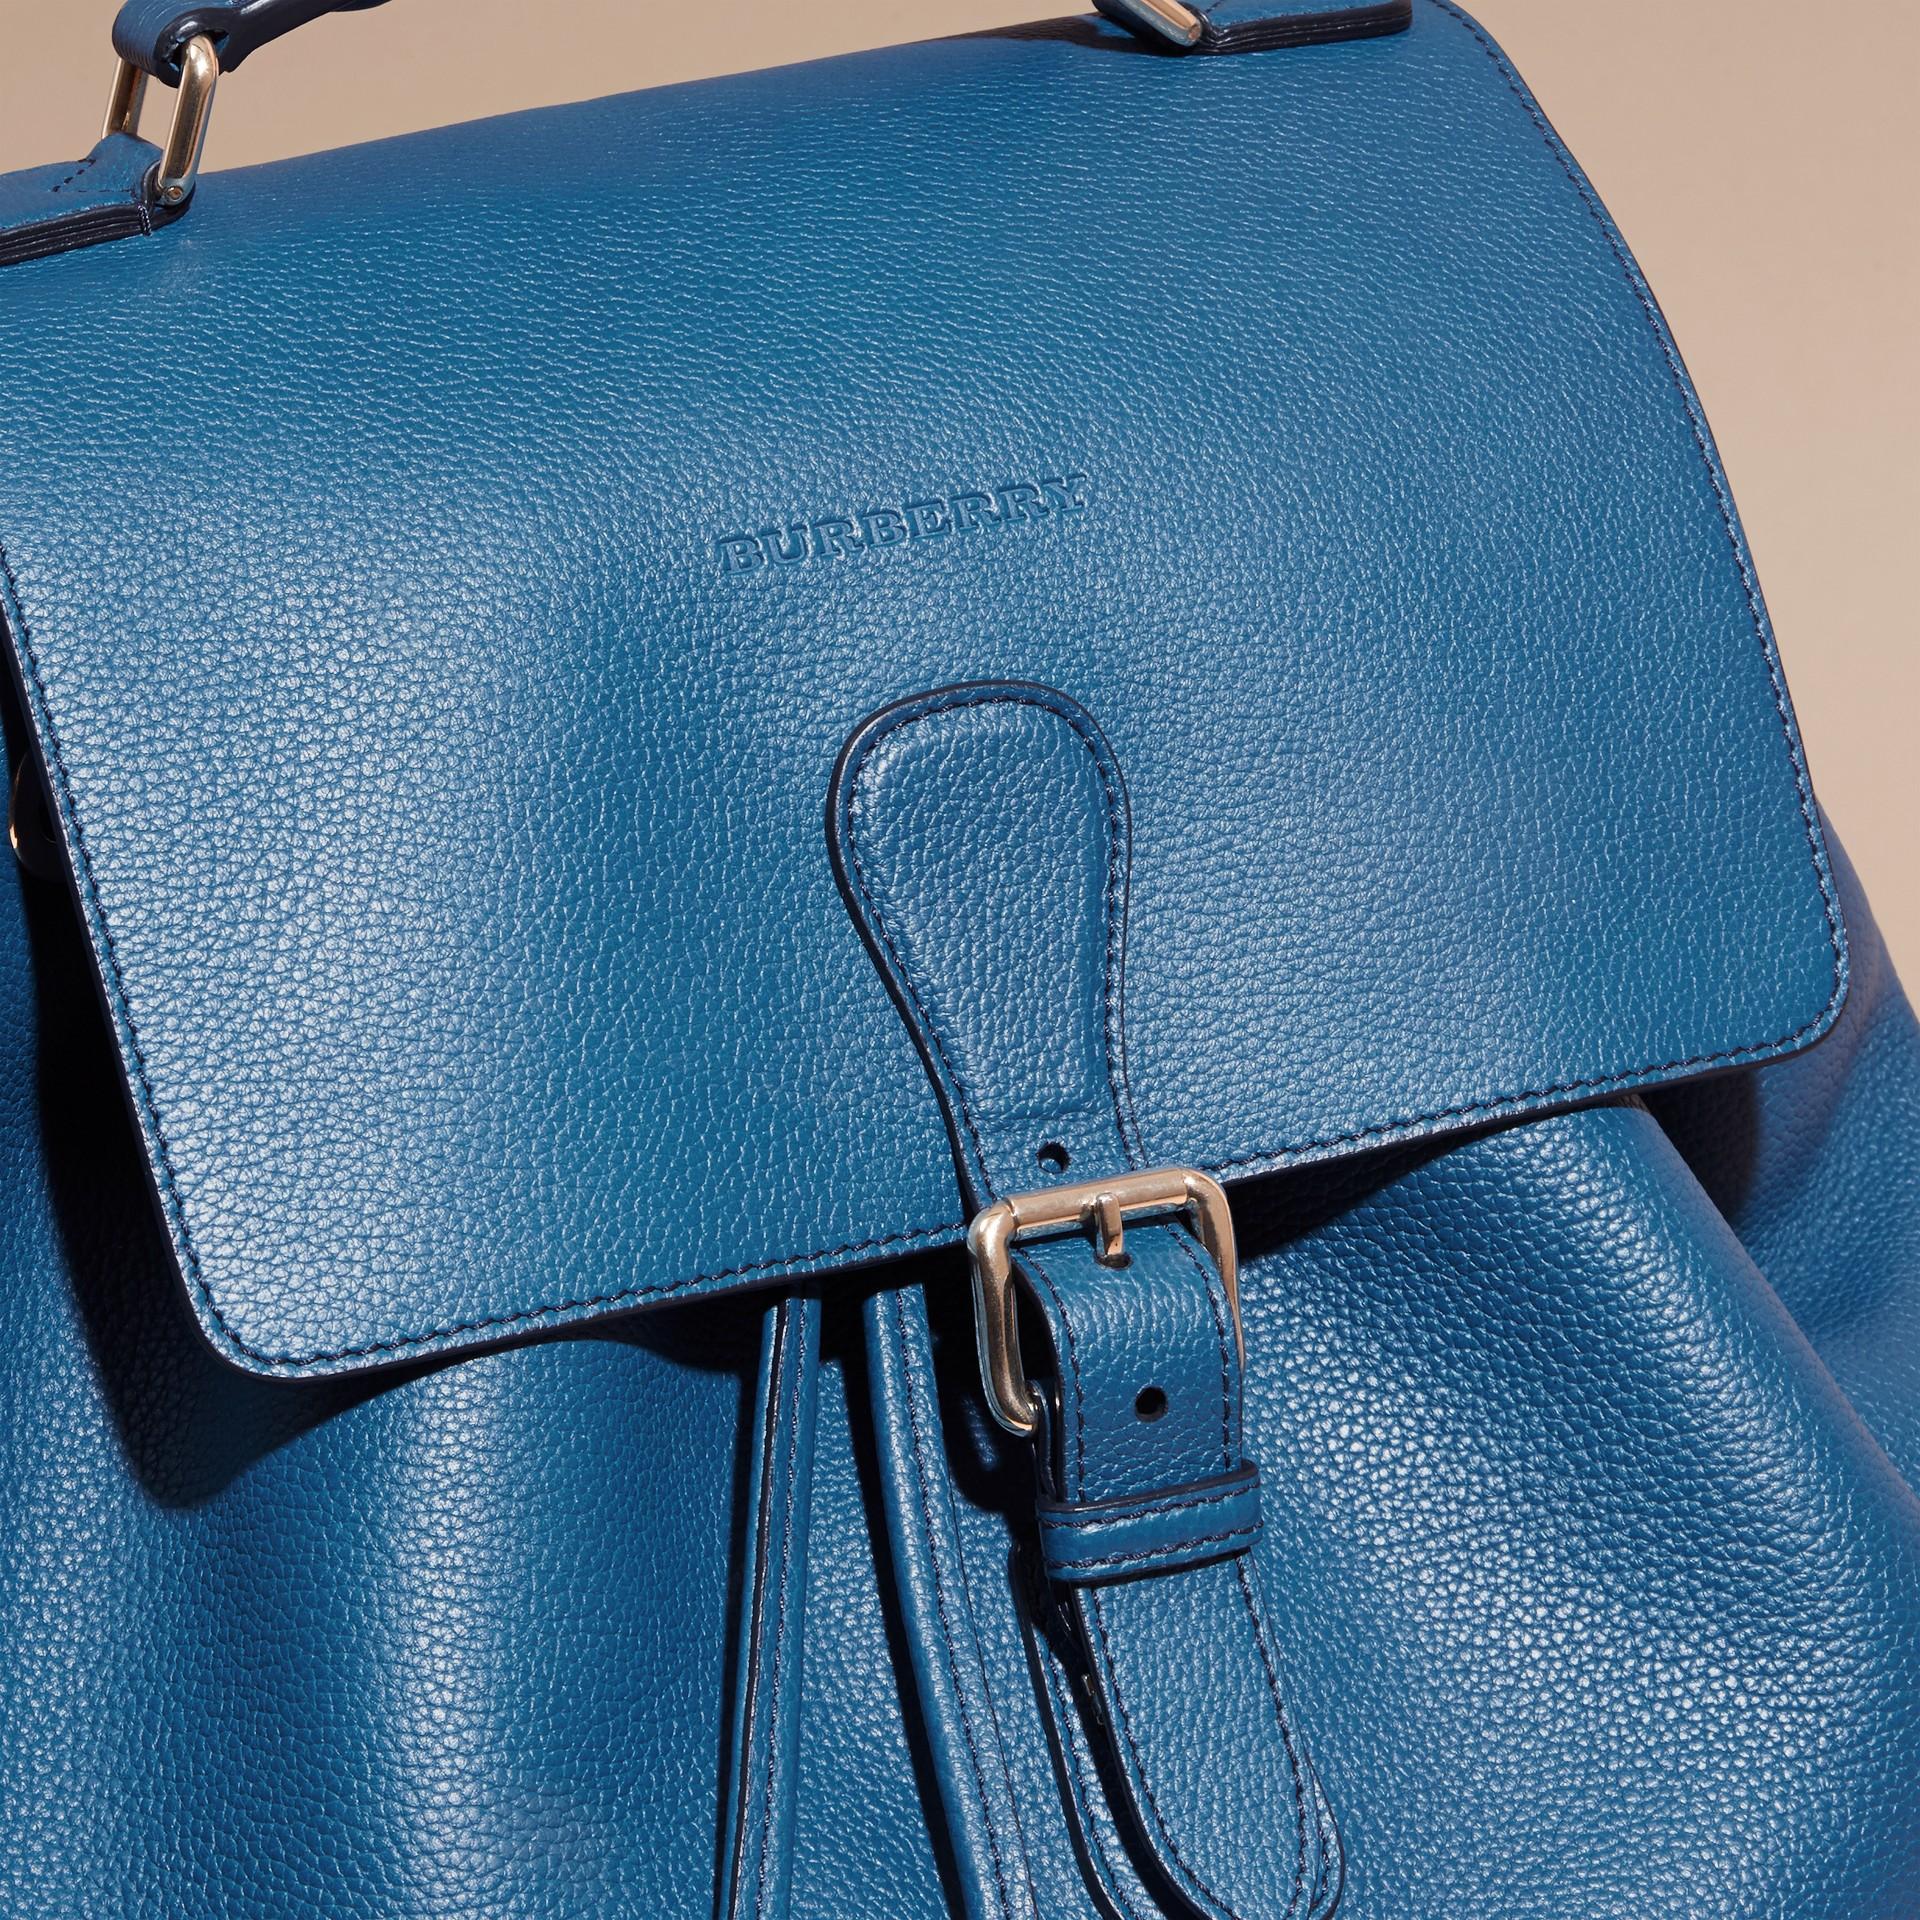 Mineralblau Rucksack aus genarbtem Leder Mineralblau - Galerie-Bild 2